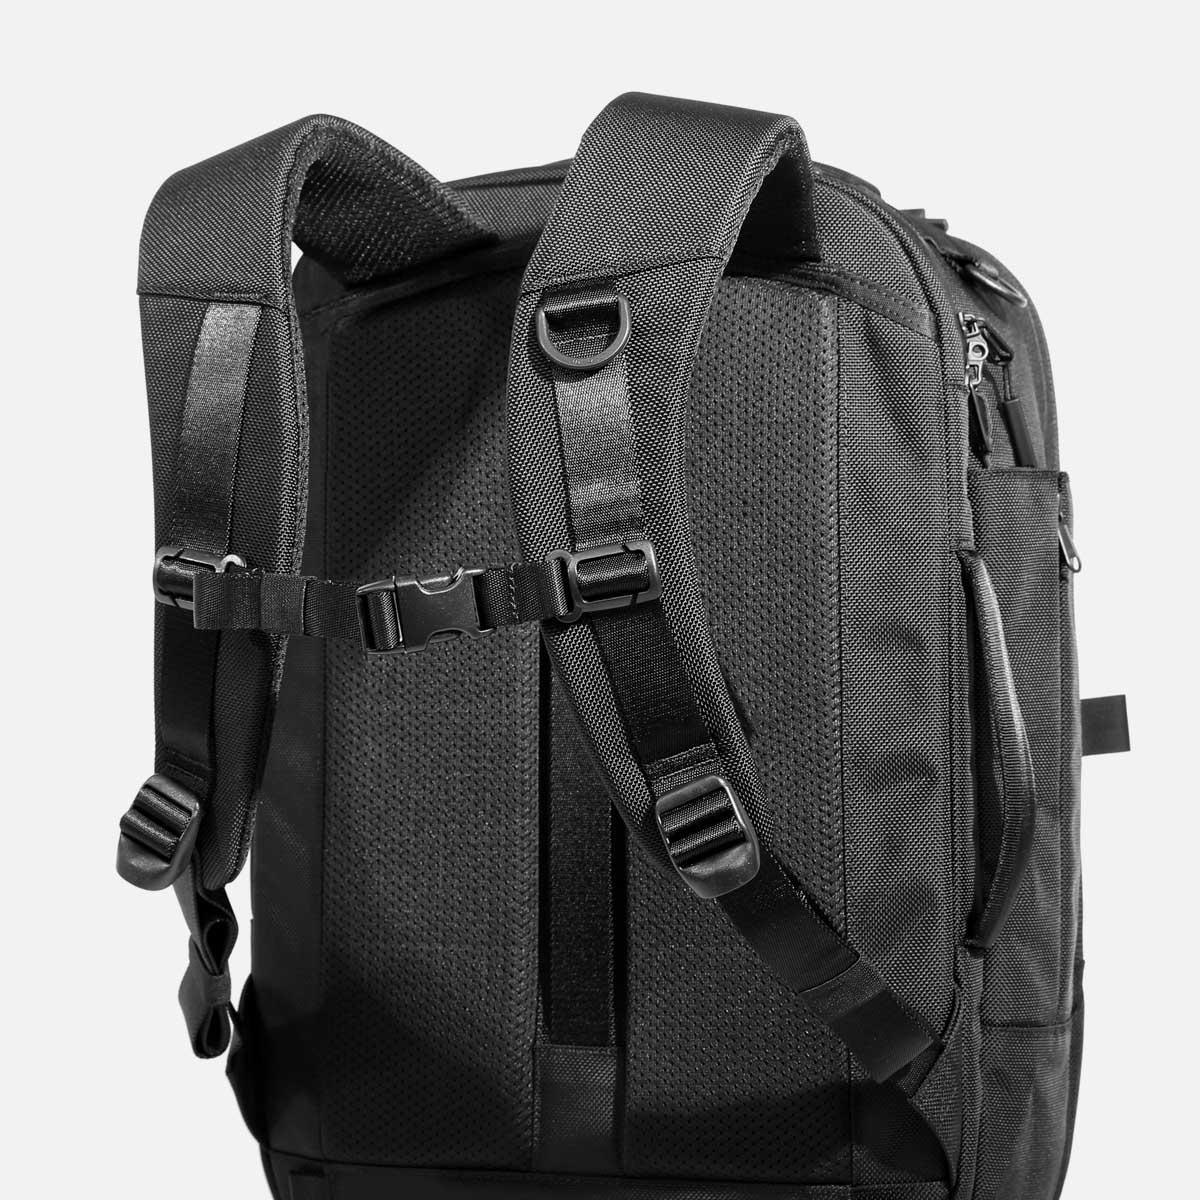 AER21022_travelpack2small_shoulderstraps.jpg